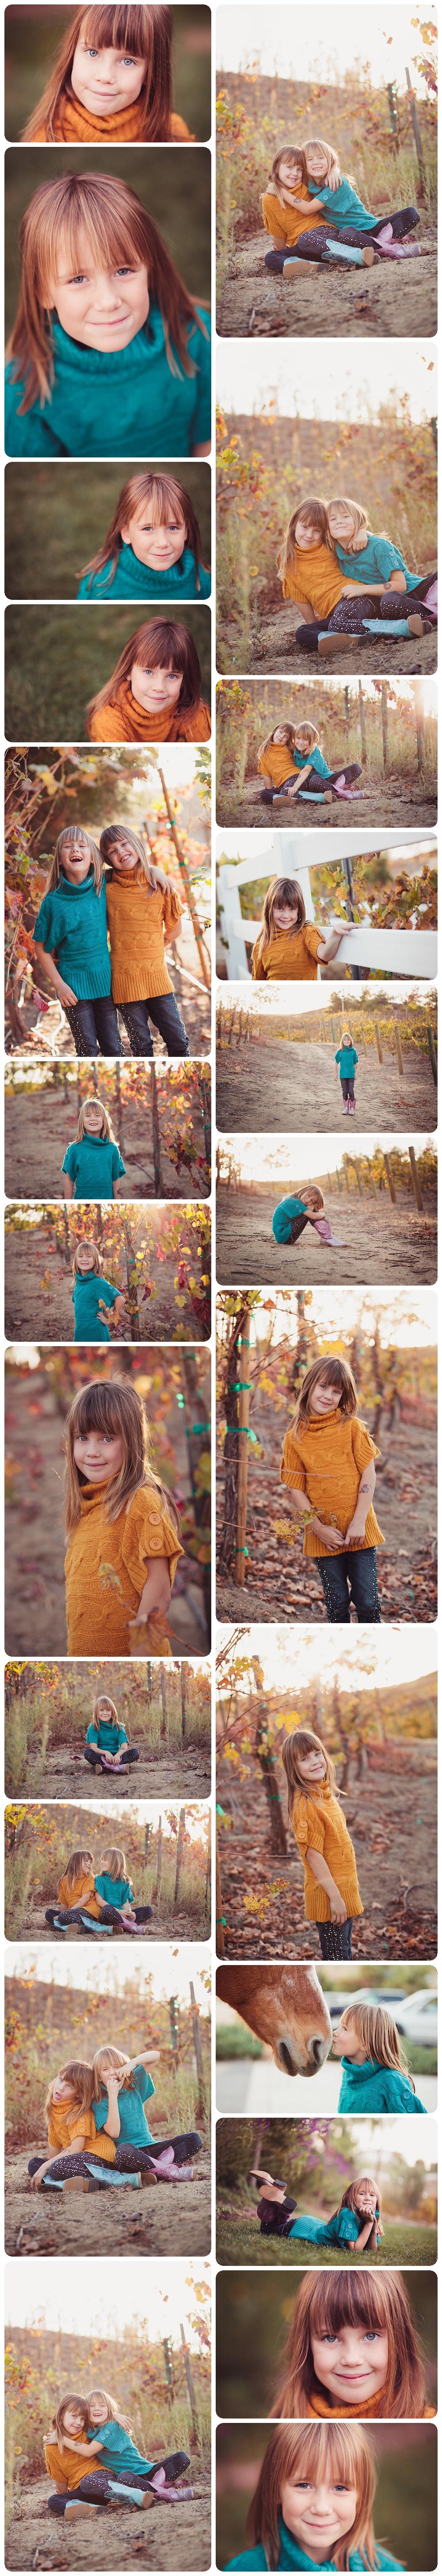 21-Melanie Monroe Photography-182.jpg